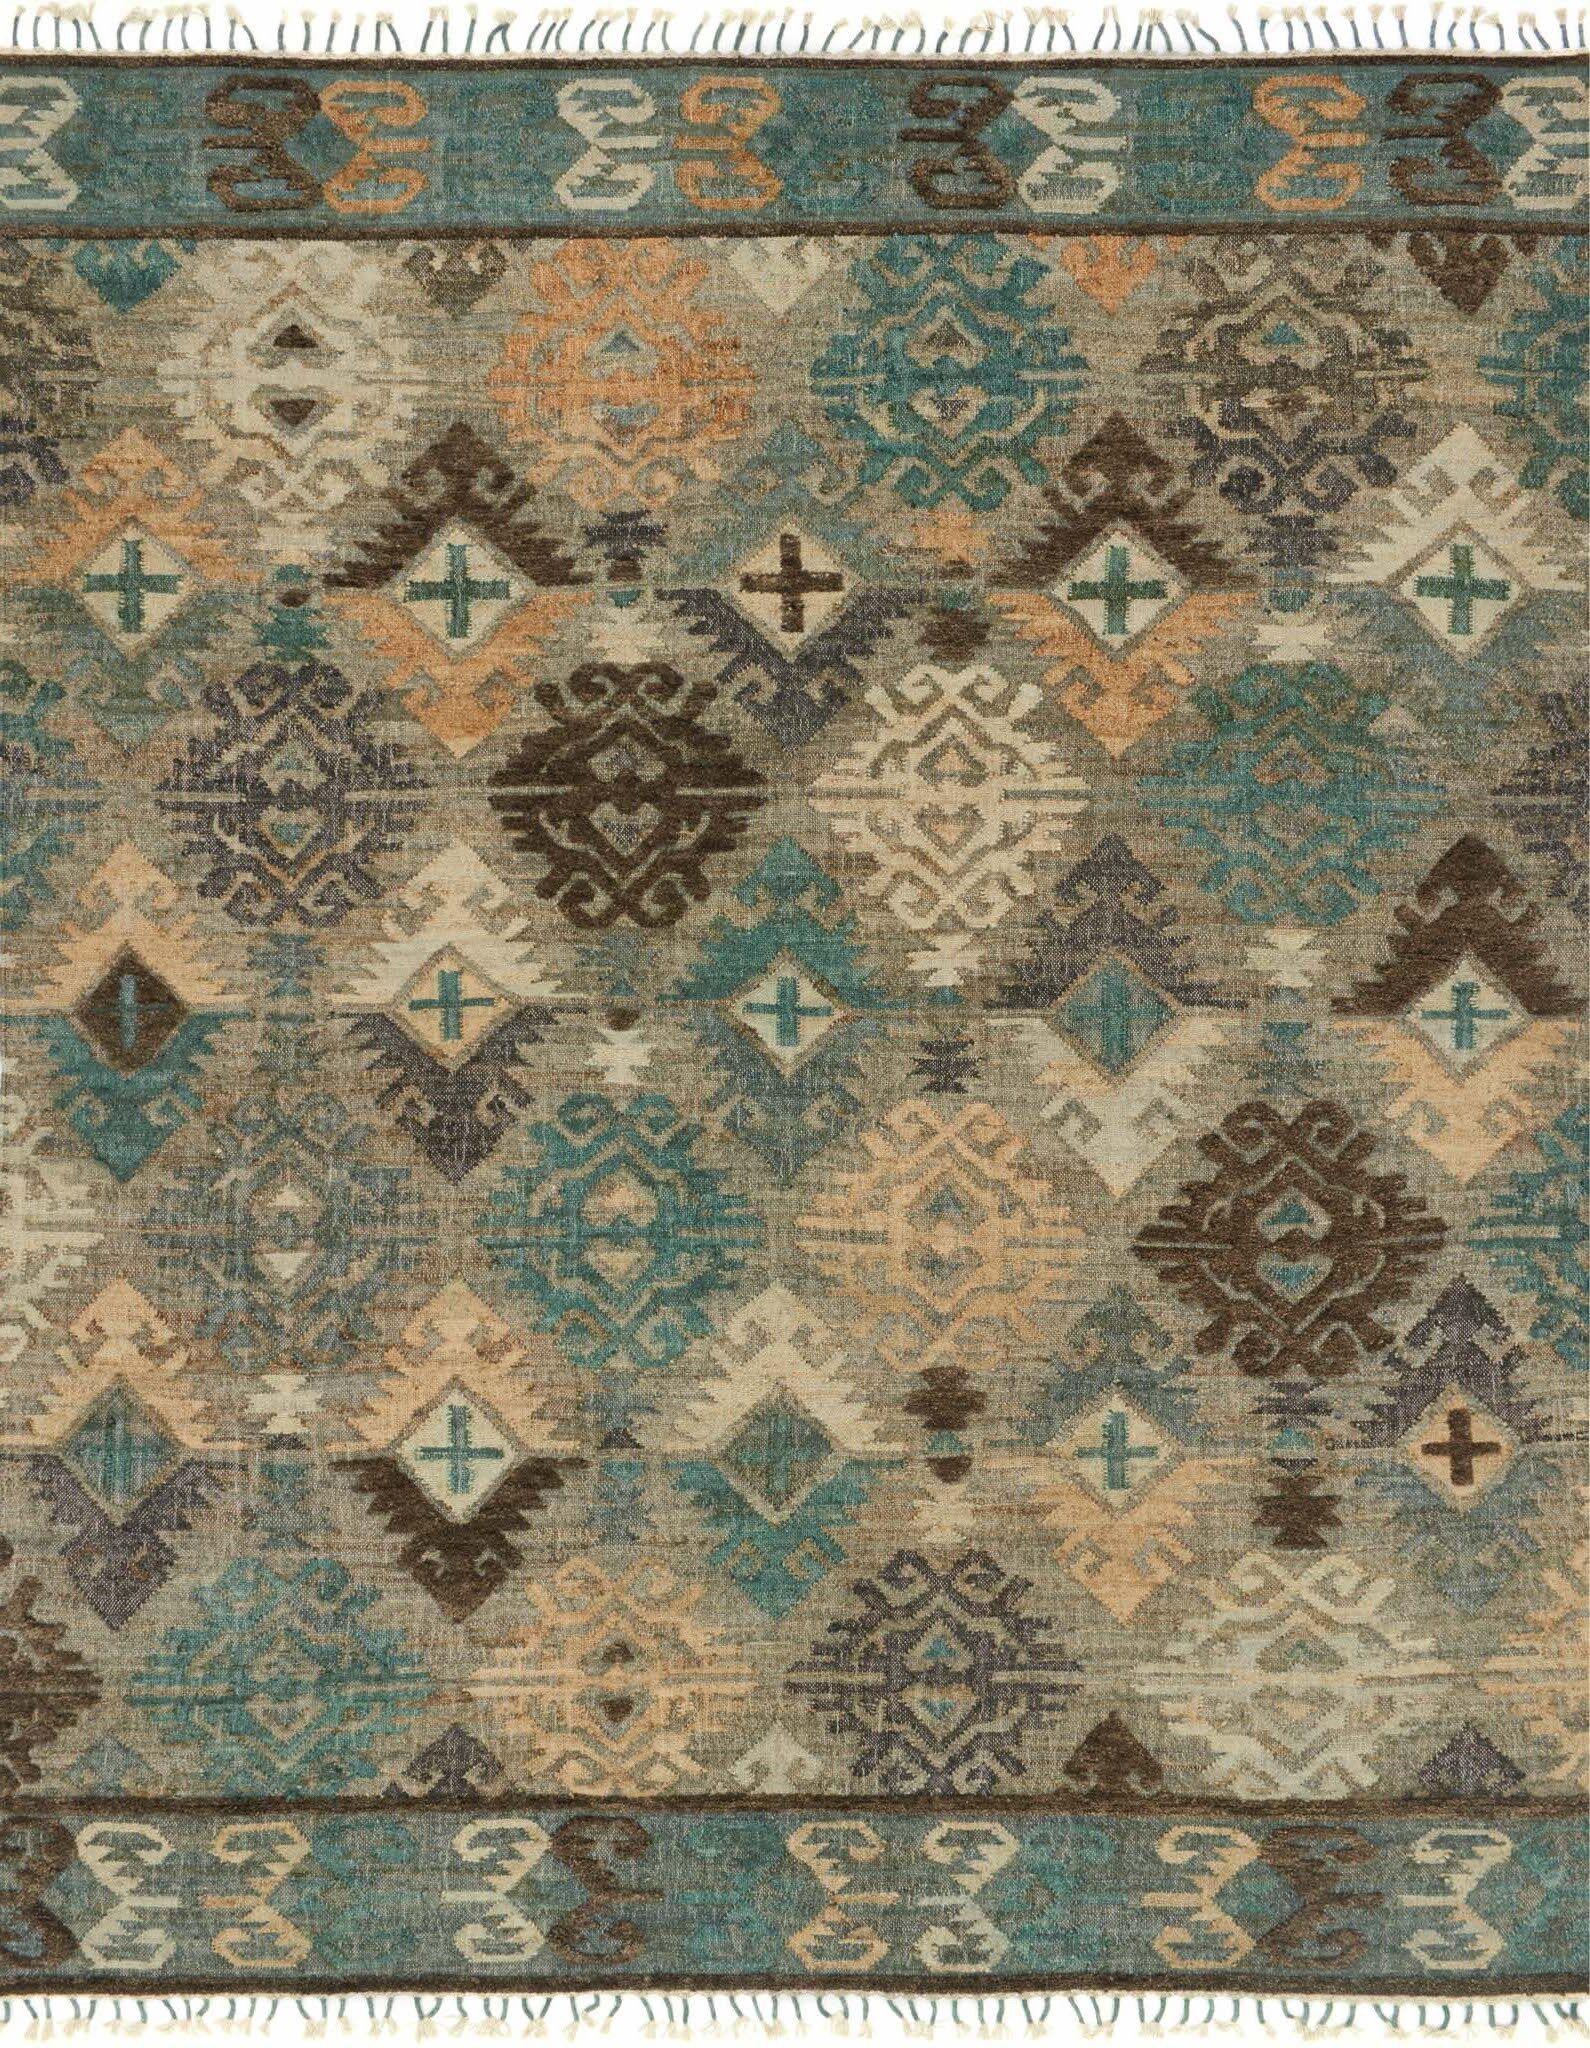 Bentonville Hand-Woven Gray/Blue Area Rug Rug Size: Runner 2'6